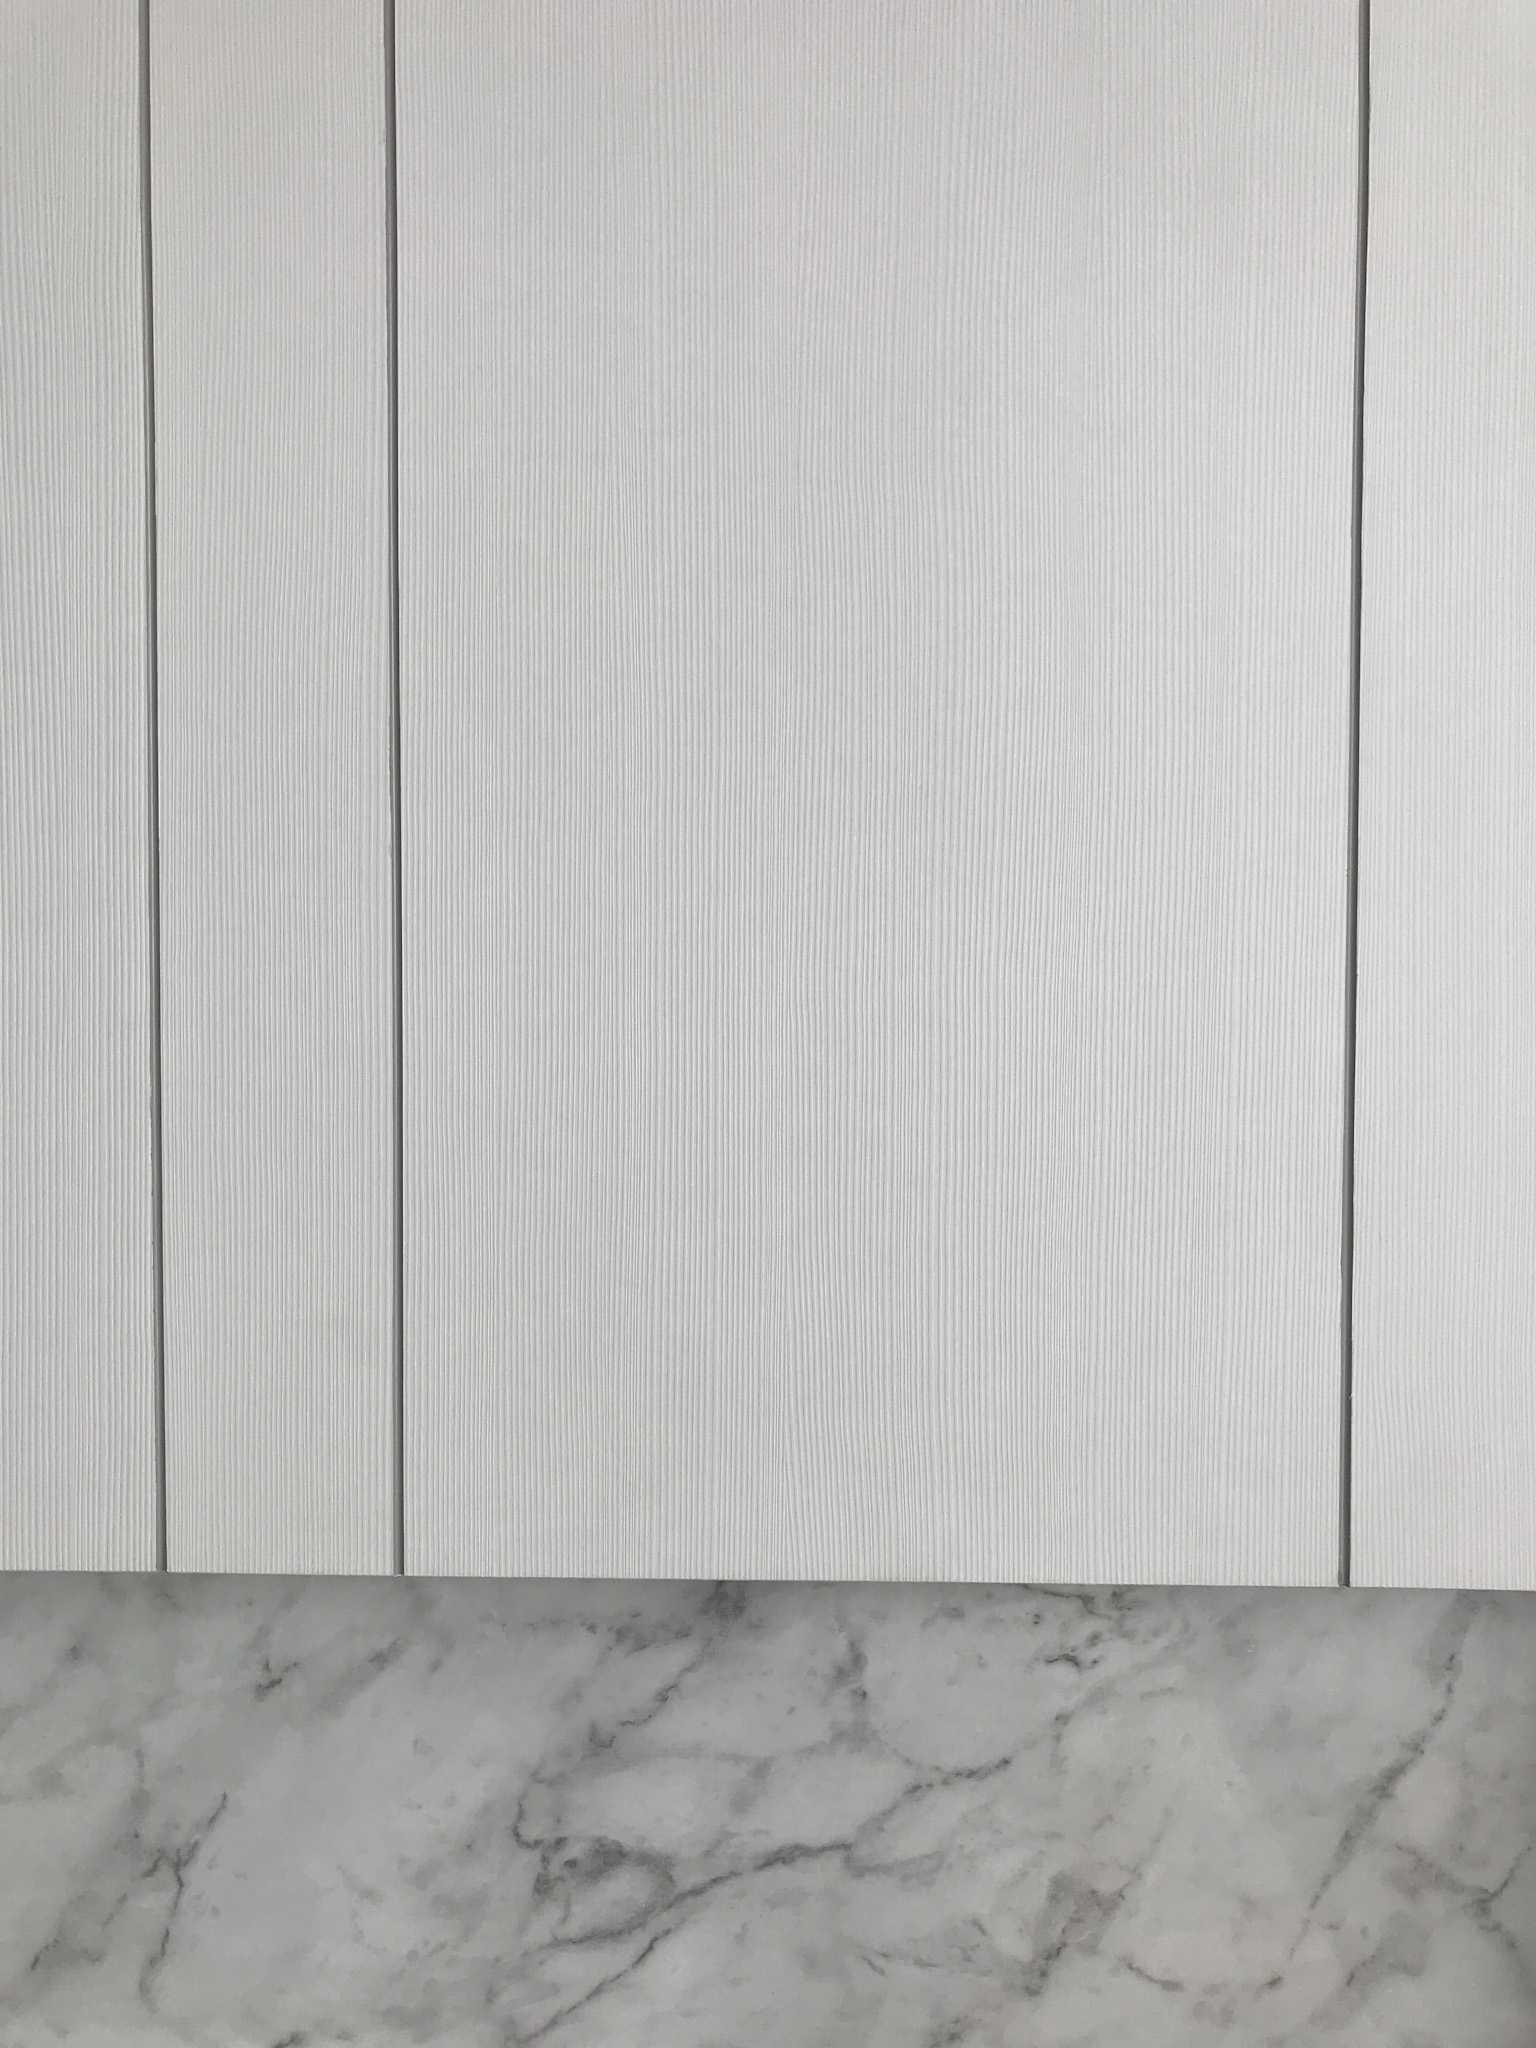 Co+In Collaborative Lab Noir Et Blanc Jl. Margonda Raya No.525A, Pondok Cina, Kecamatan Beji, Kota Depok, Jawa Barat 16424, Indonesia Depok, Kota Depok, Jawa Barat, Indonesia Coin-Collaborative-Lab-Noir-Et-Blanc   84661